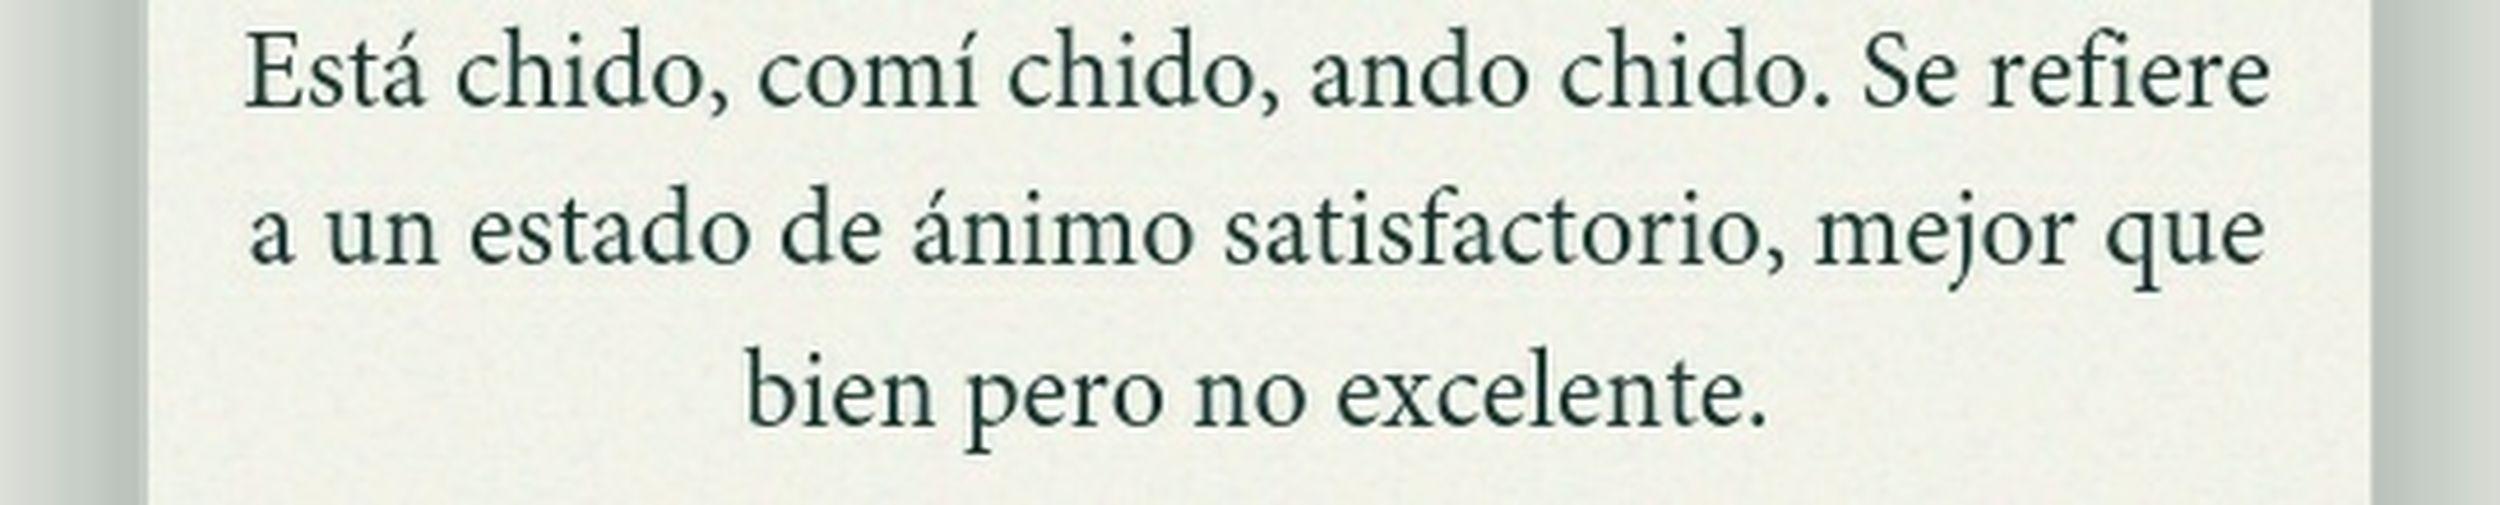 Chido #cool #bien #chingon #like #buenisimo #pocamadre